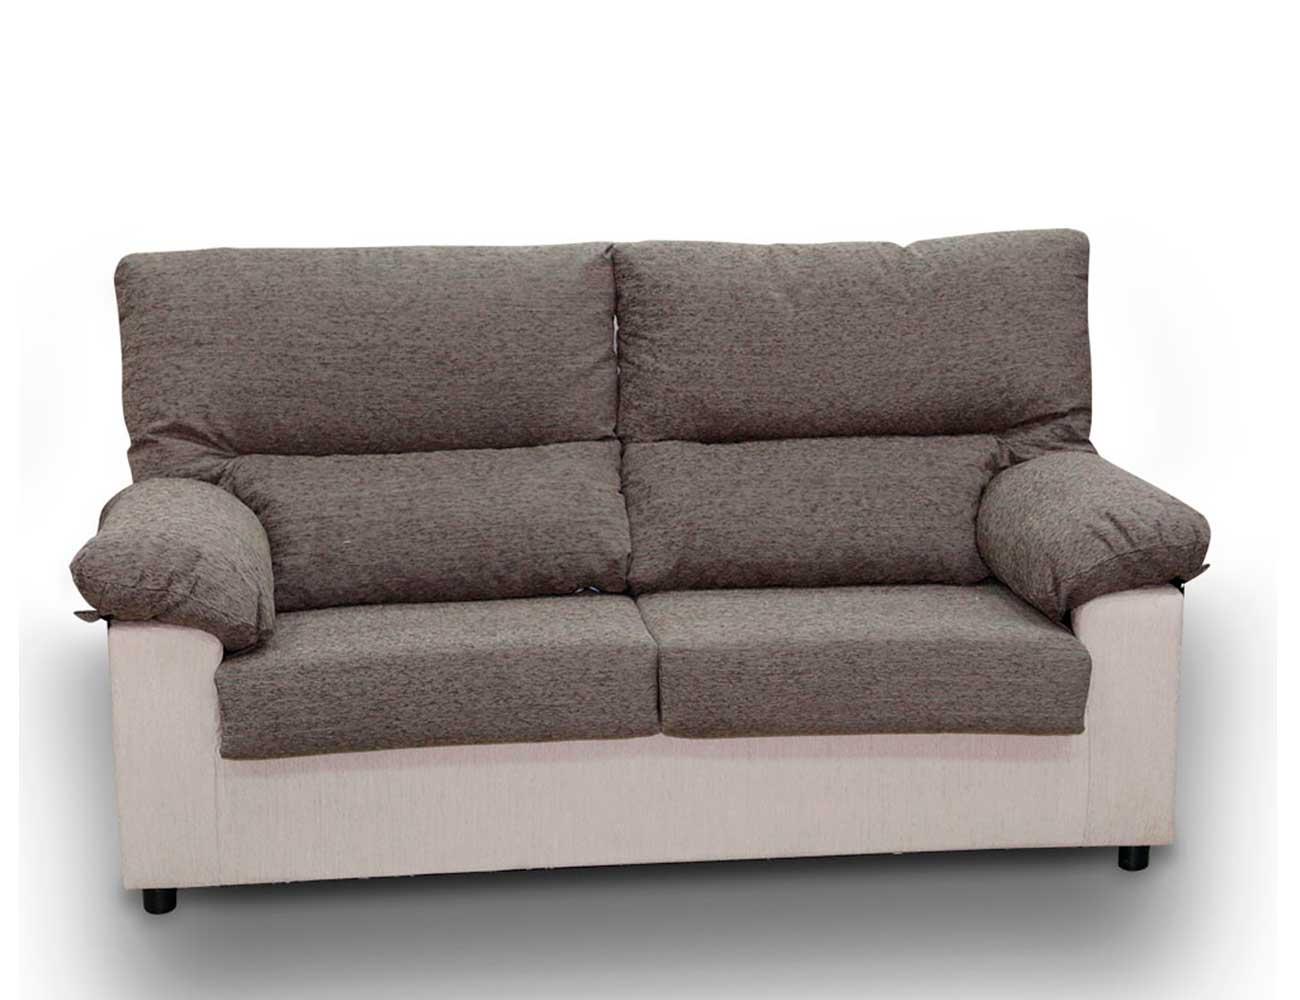 Sofa 3 plazas barato24